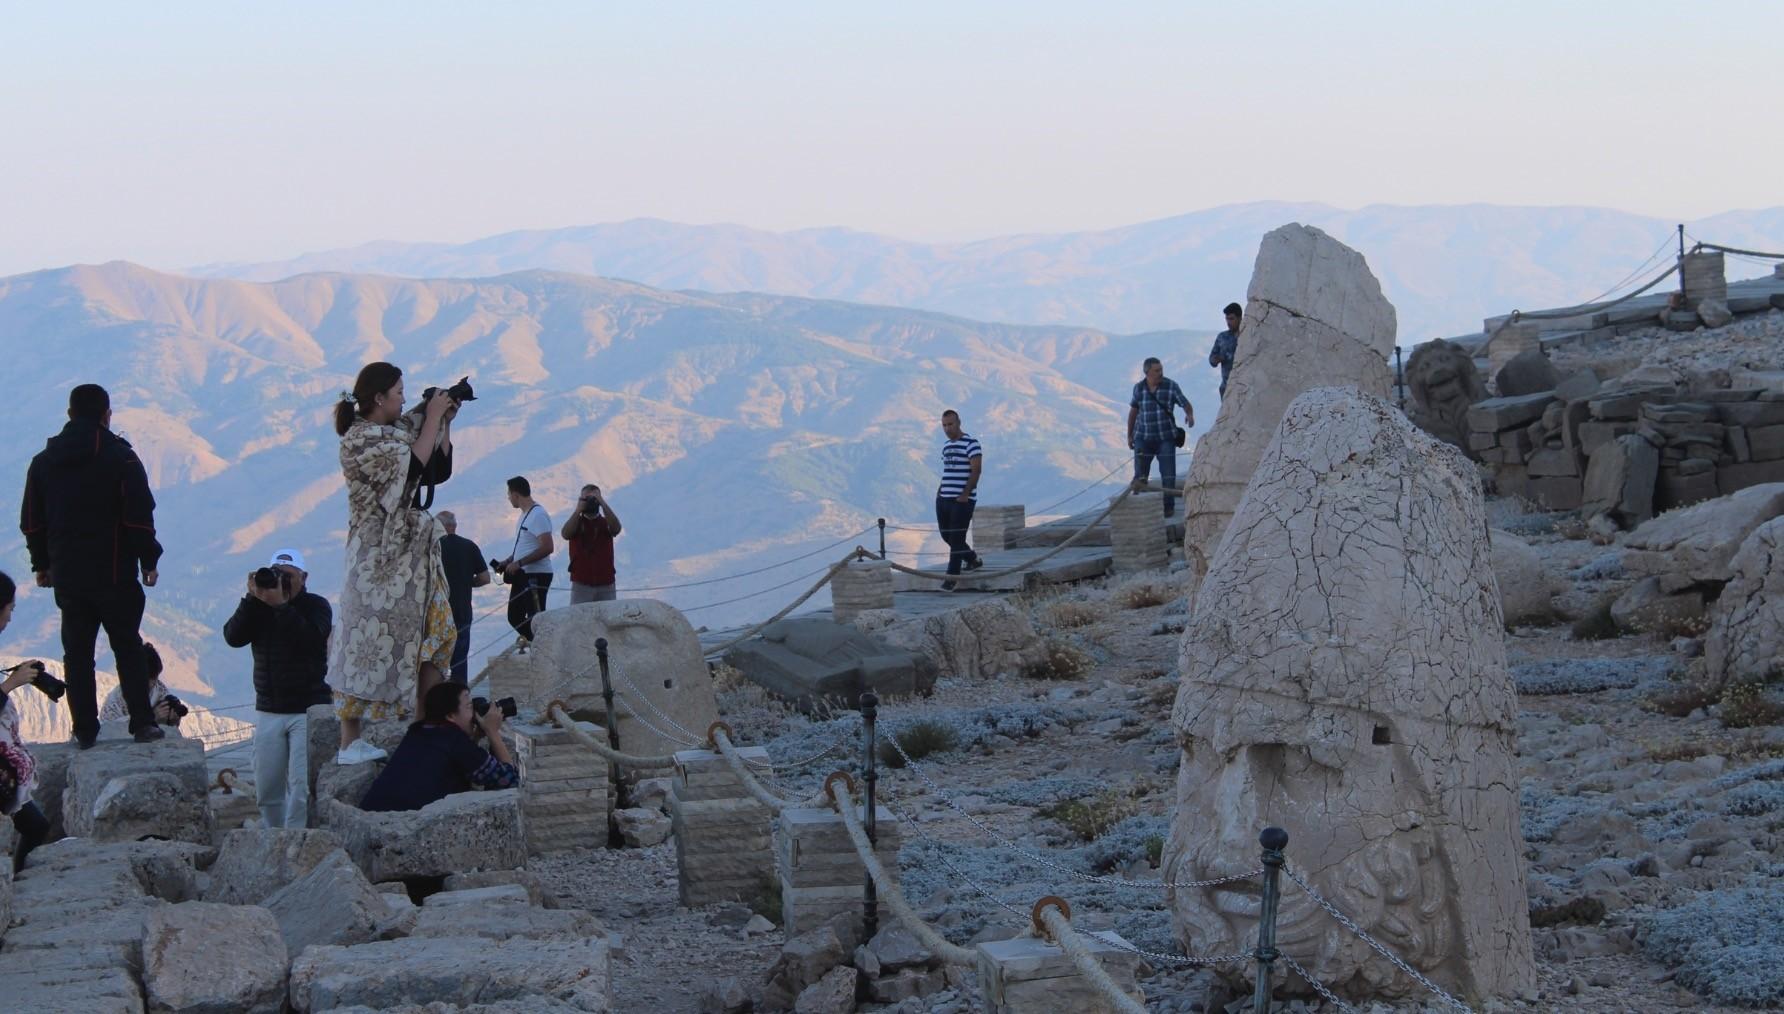 South Korean bloggers take photos at Mt. Nemrut.